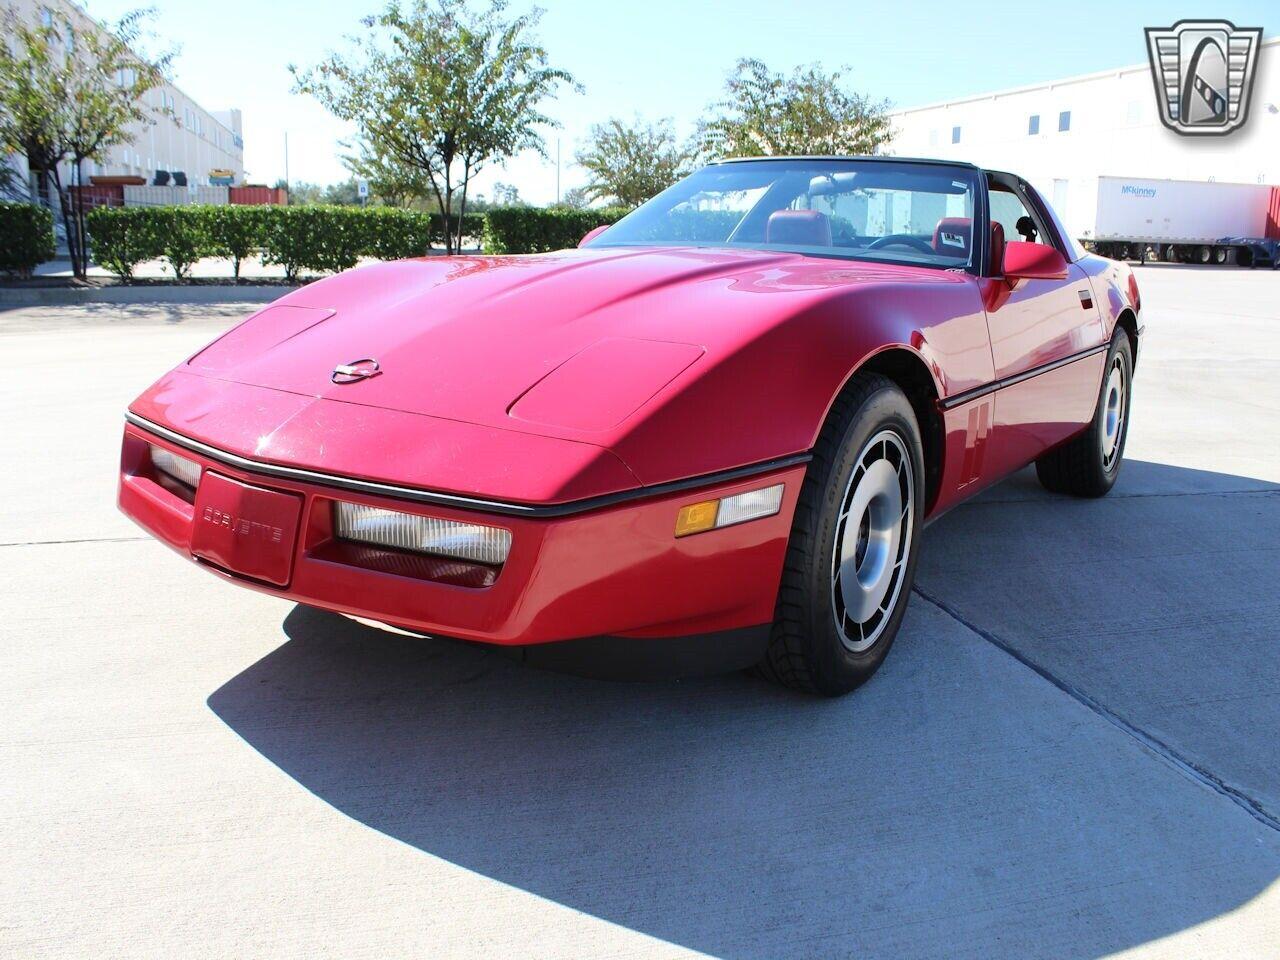 1984 Red Chevrolet Corvette     C4 Corvette Photo 3